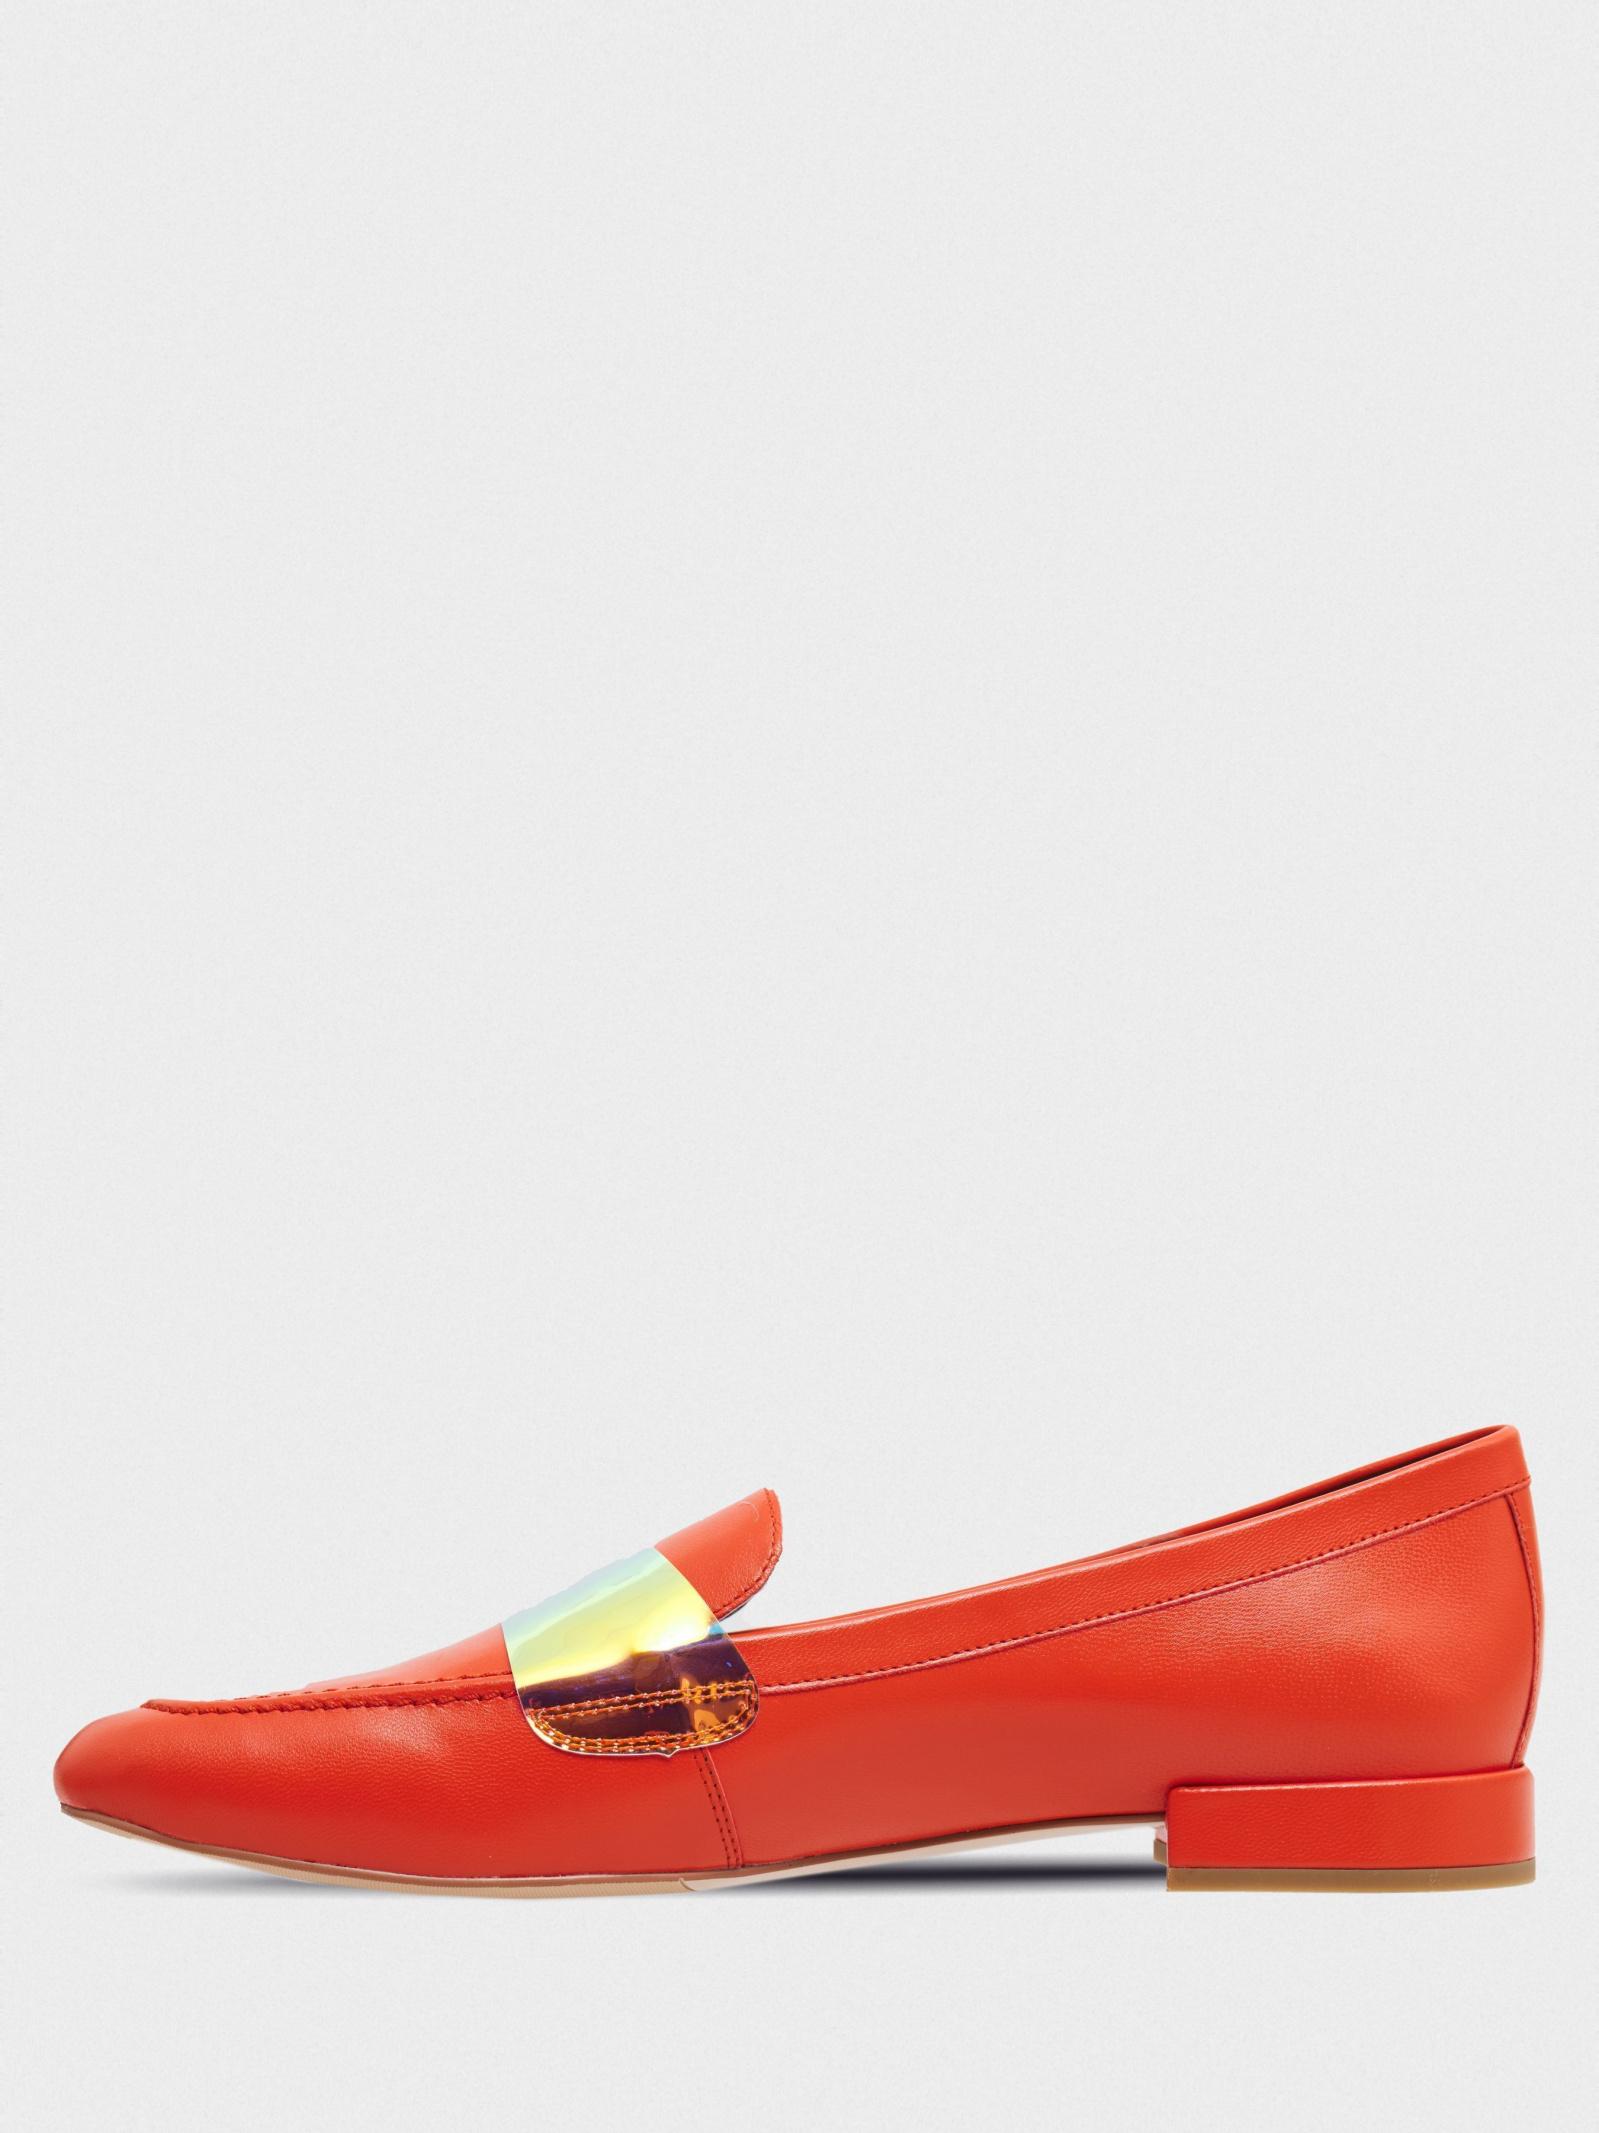 Туфли для женщин Braska BS3261 цена, 2017